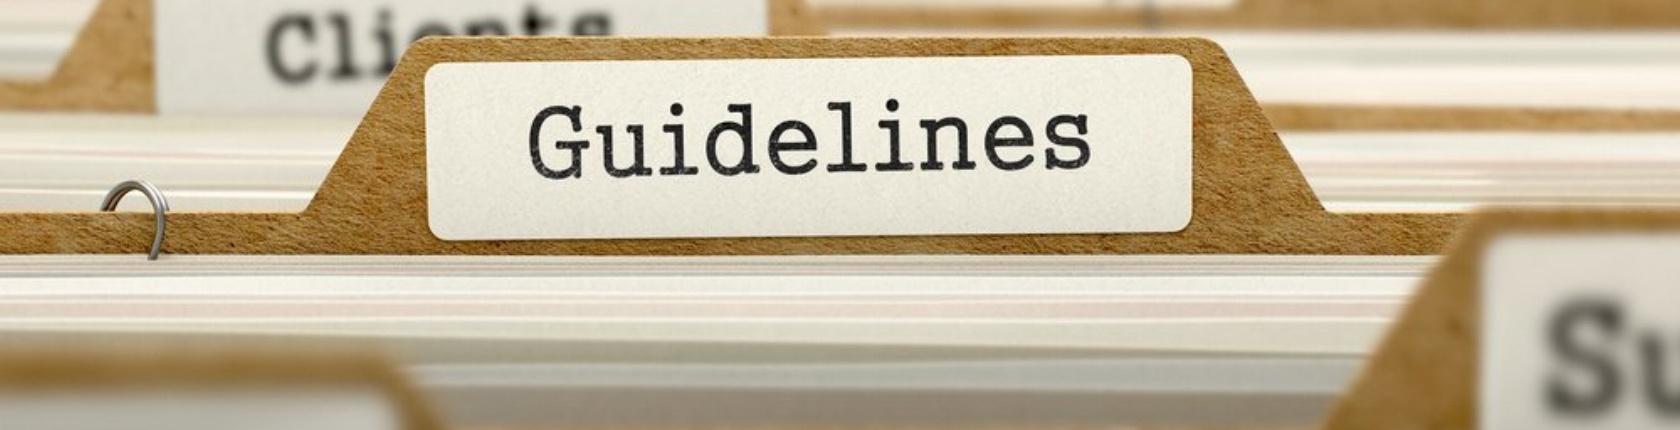 Guidelines Concept. Word on Folder Register of Card Index. Selective Focus.-893998-edited.jpeg